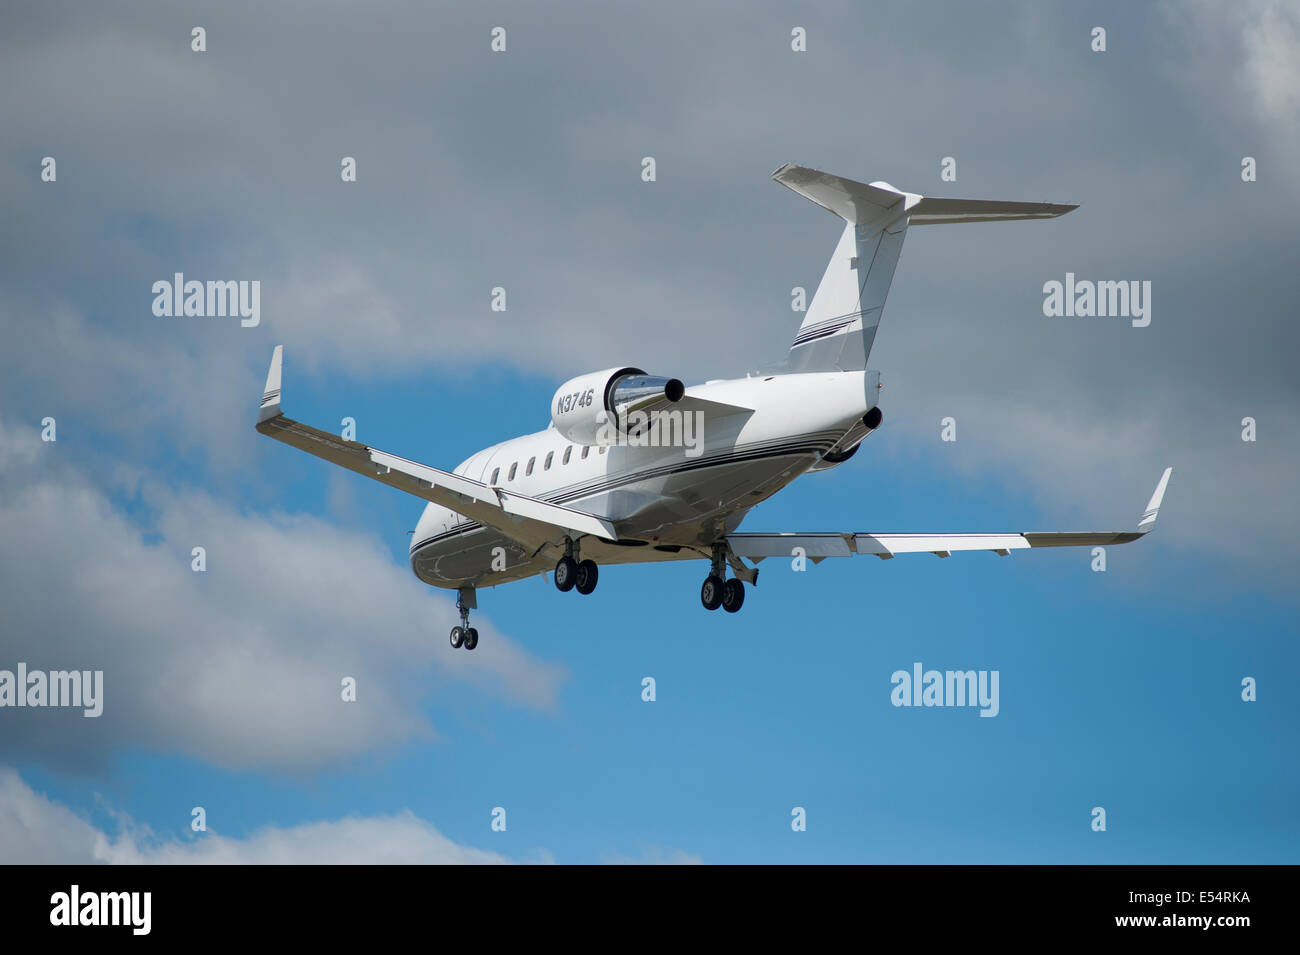 Canadair Challenger jet VIP aircraft N3746 landing at Farnborough International Airshow 2014 - Stock Image